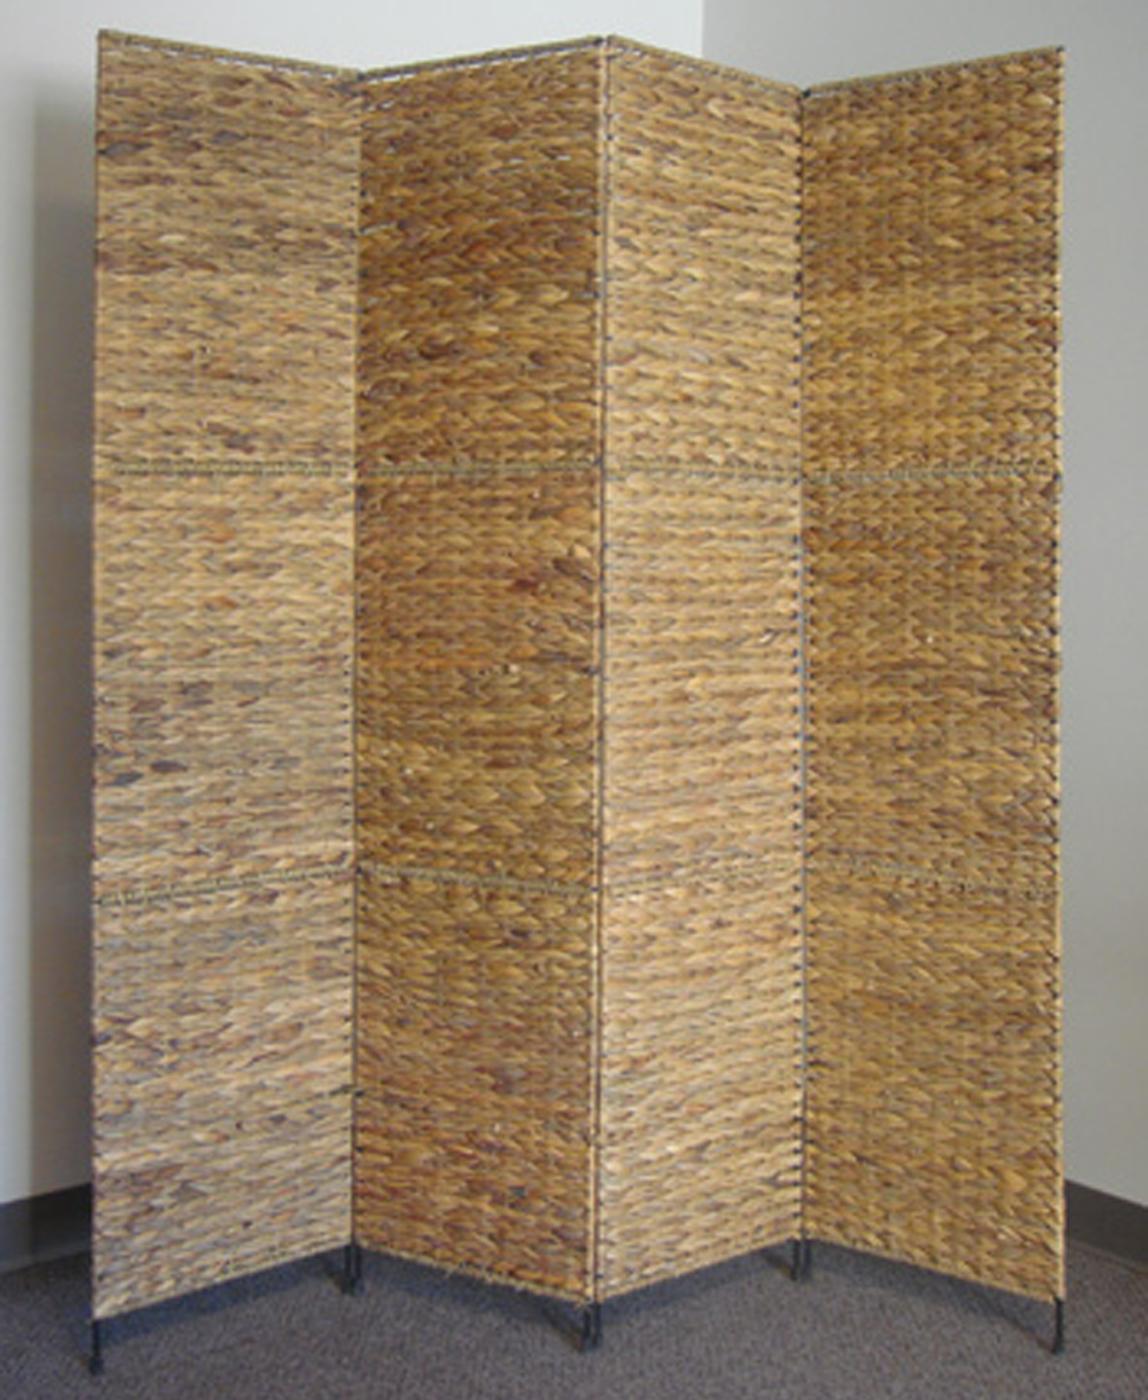 jakarta folding screen by proman products price